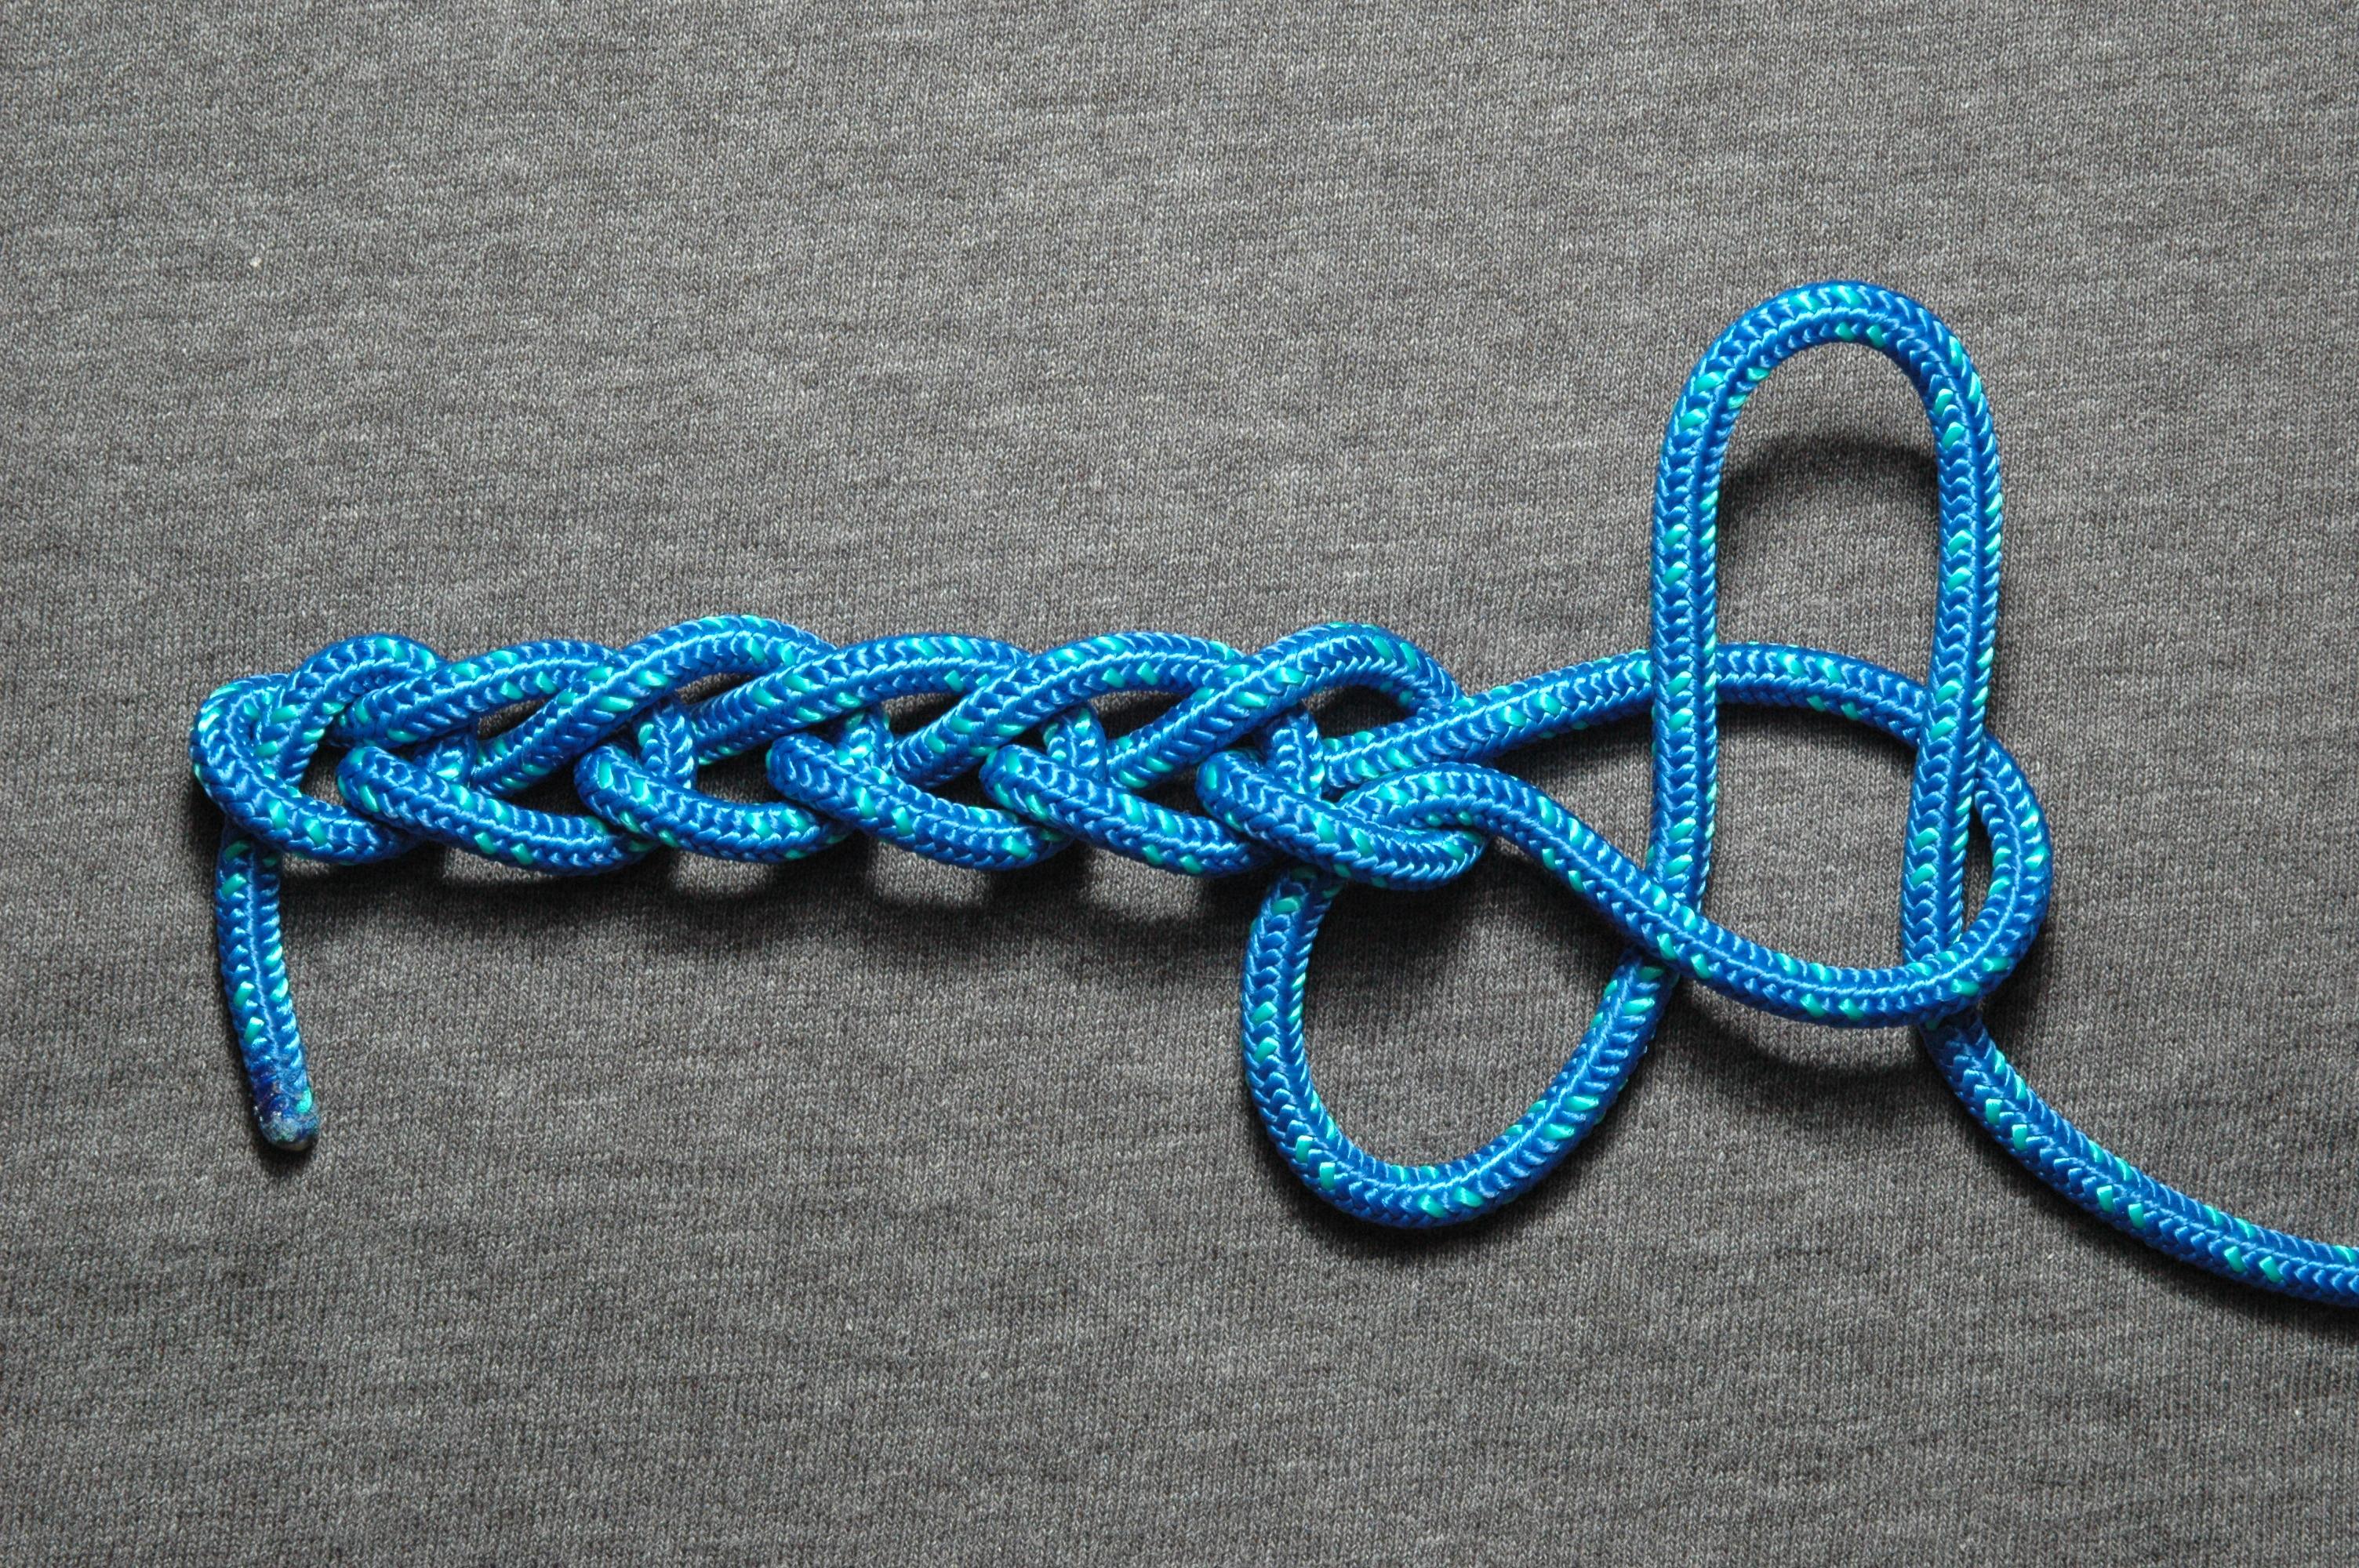 Chain sinnet - Wikiwand